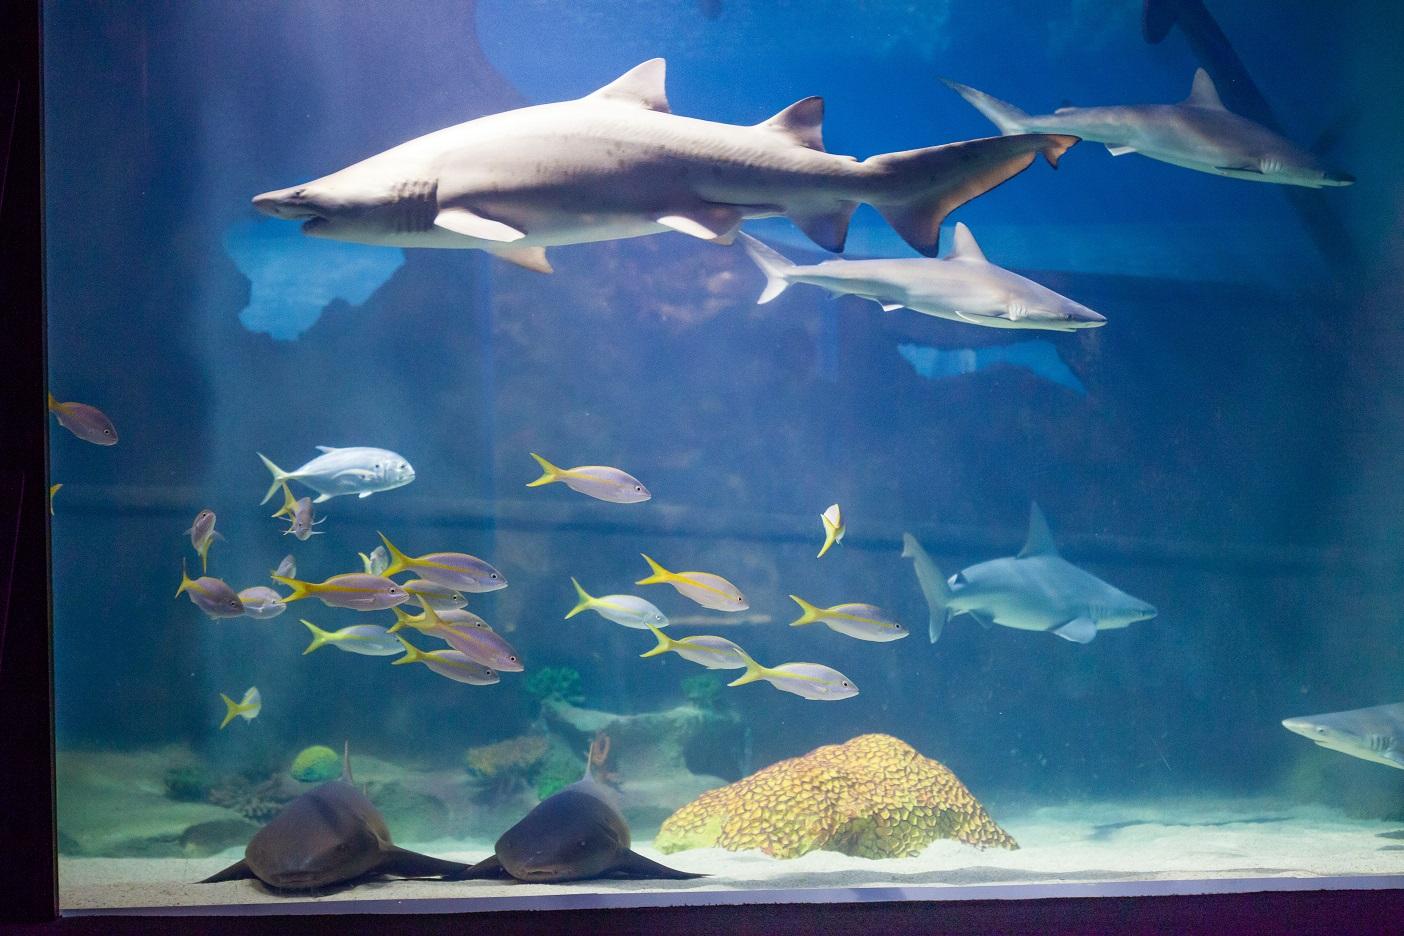 Greater Cleveland Aquarium's Fin Fest